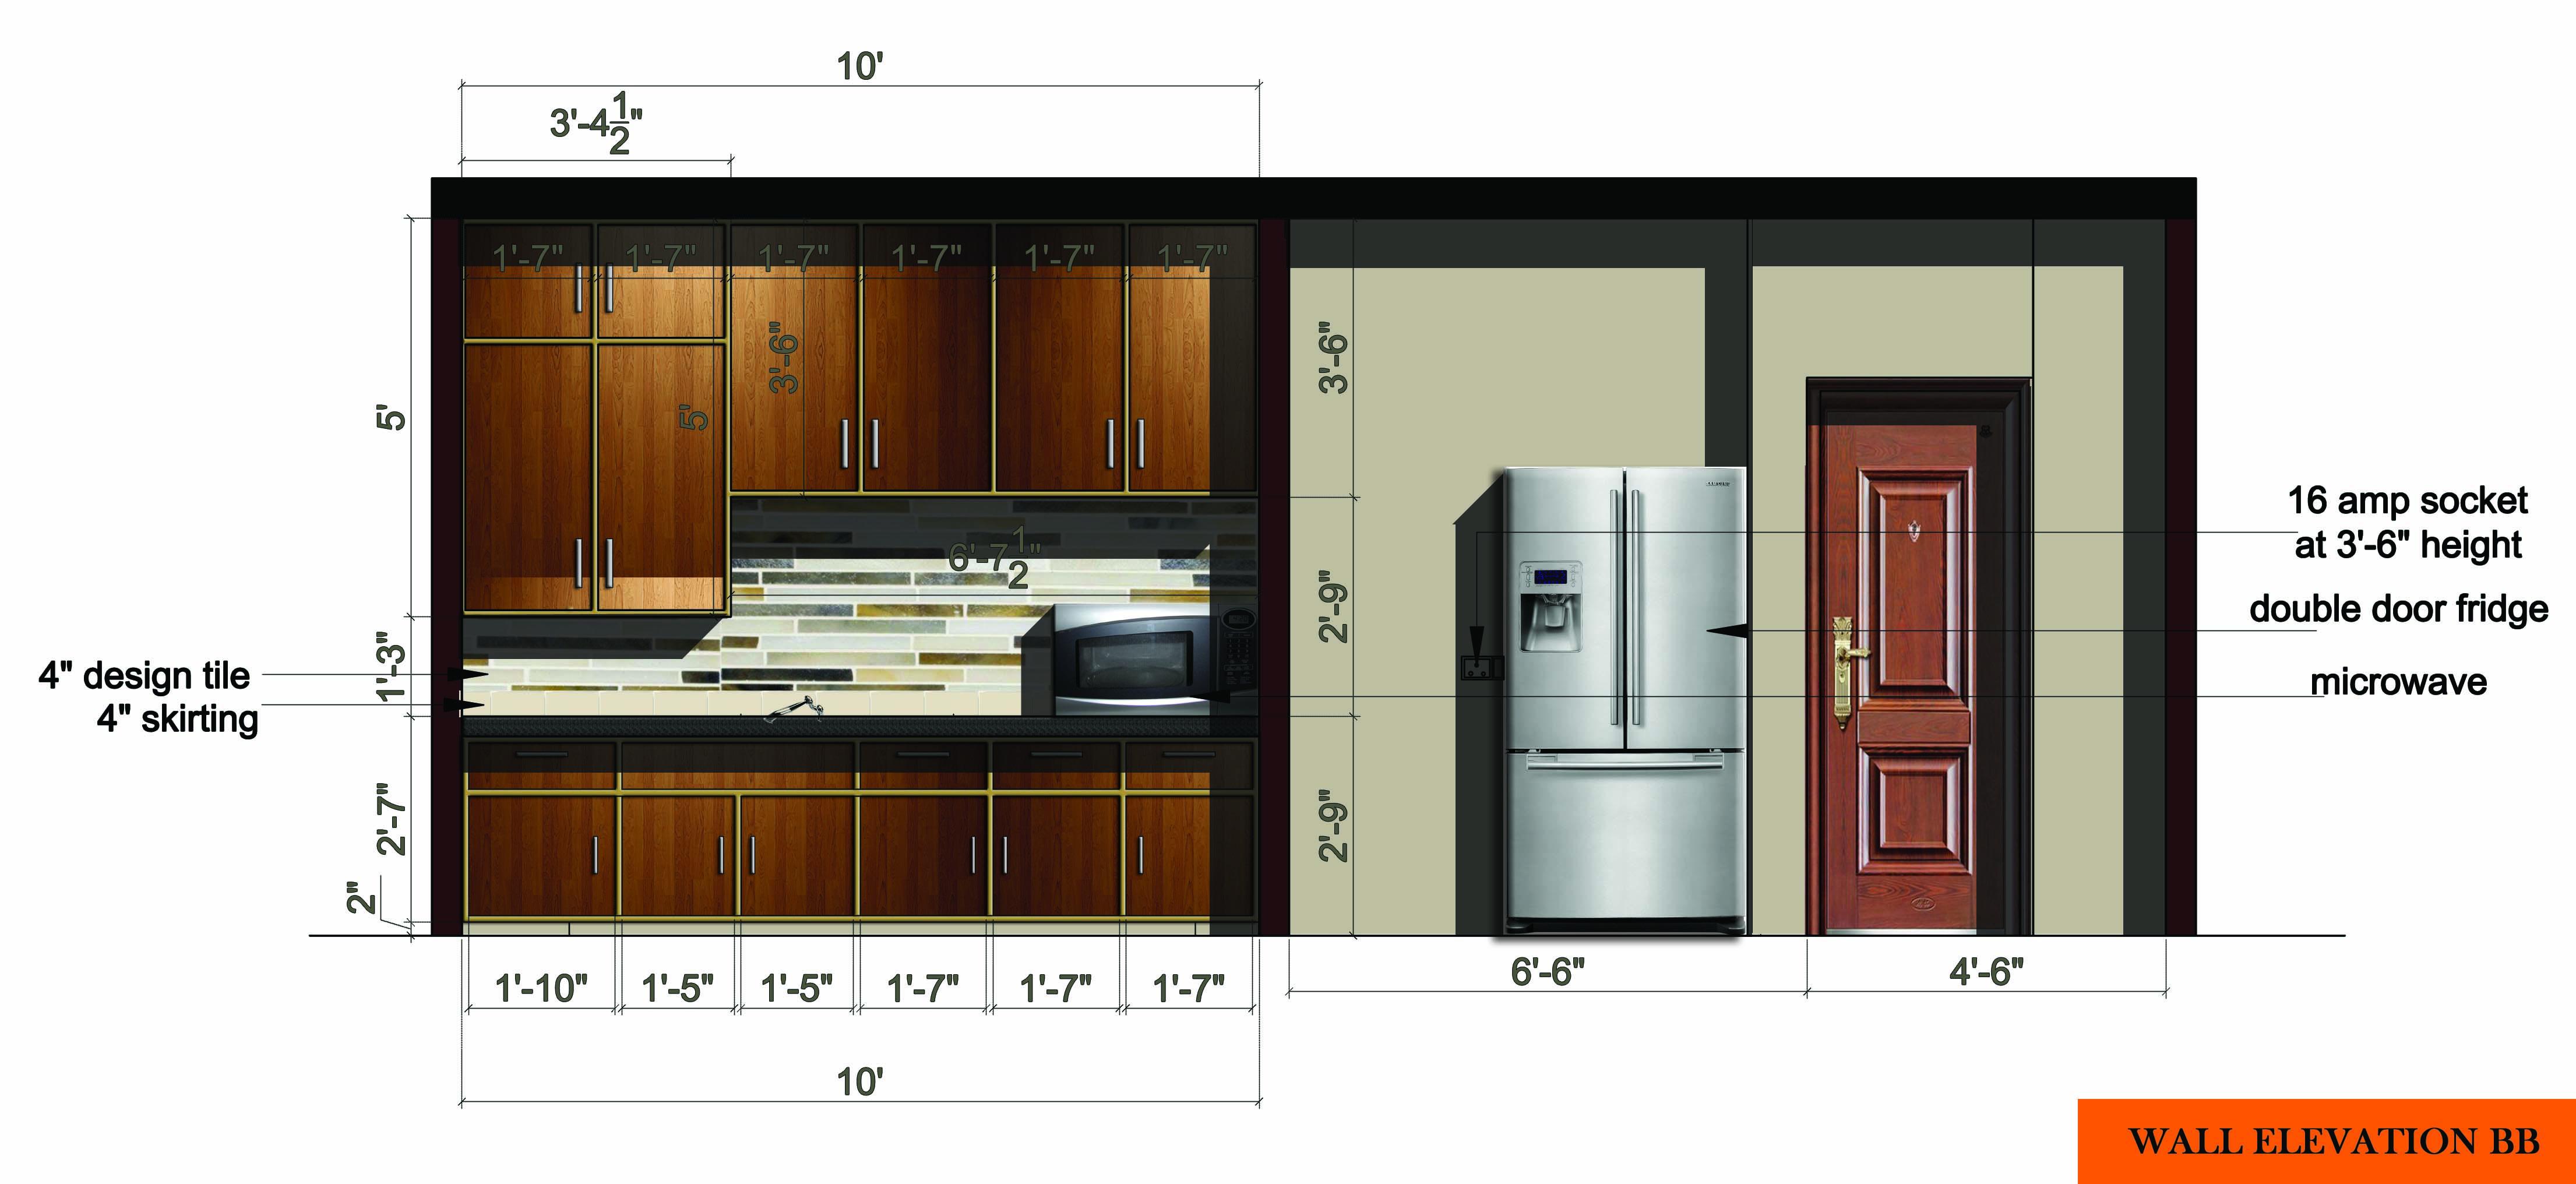 Wood River Il Elevation : Kitchen design project designed by elements studio